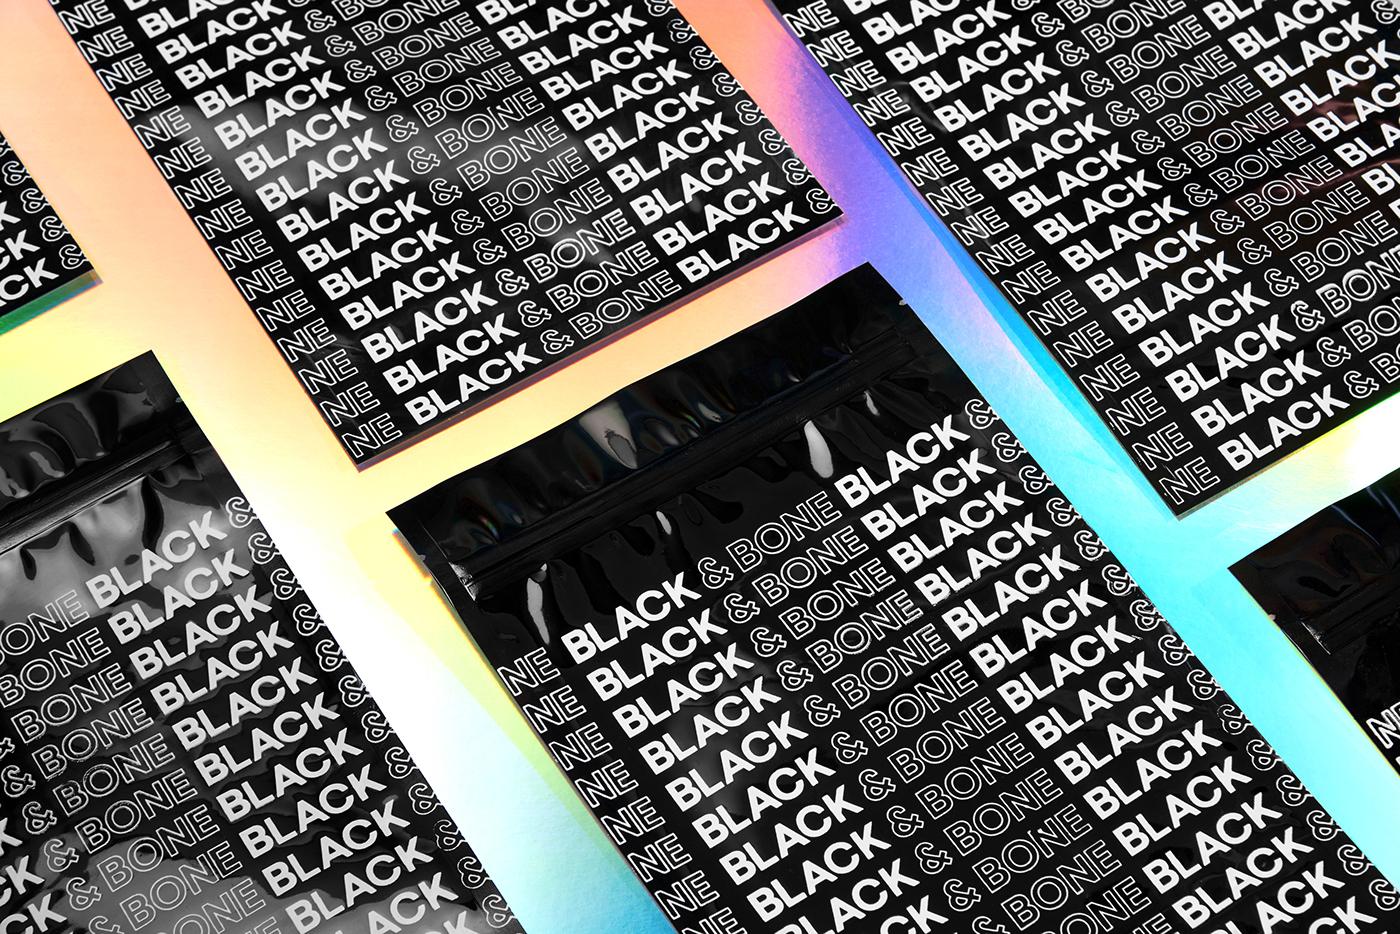 Black & Bone女装品牌设计 欣赏-第7张